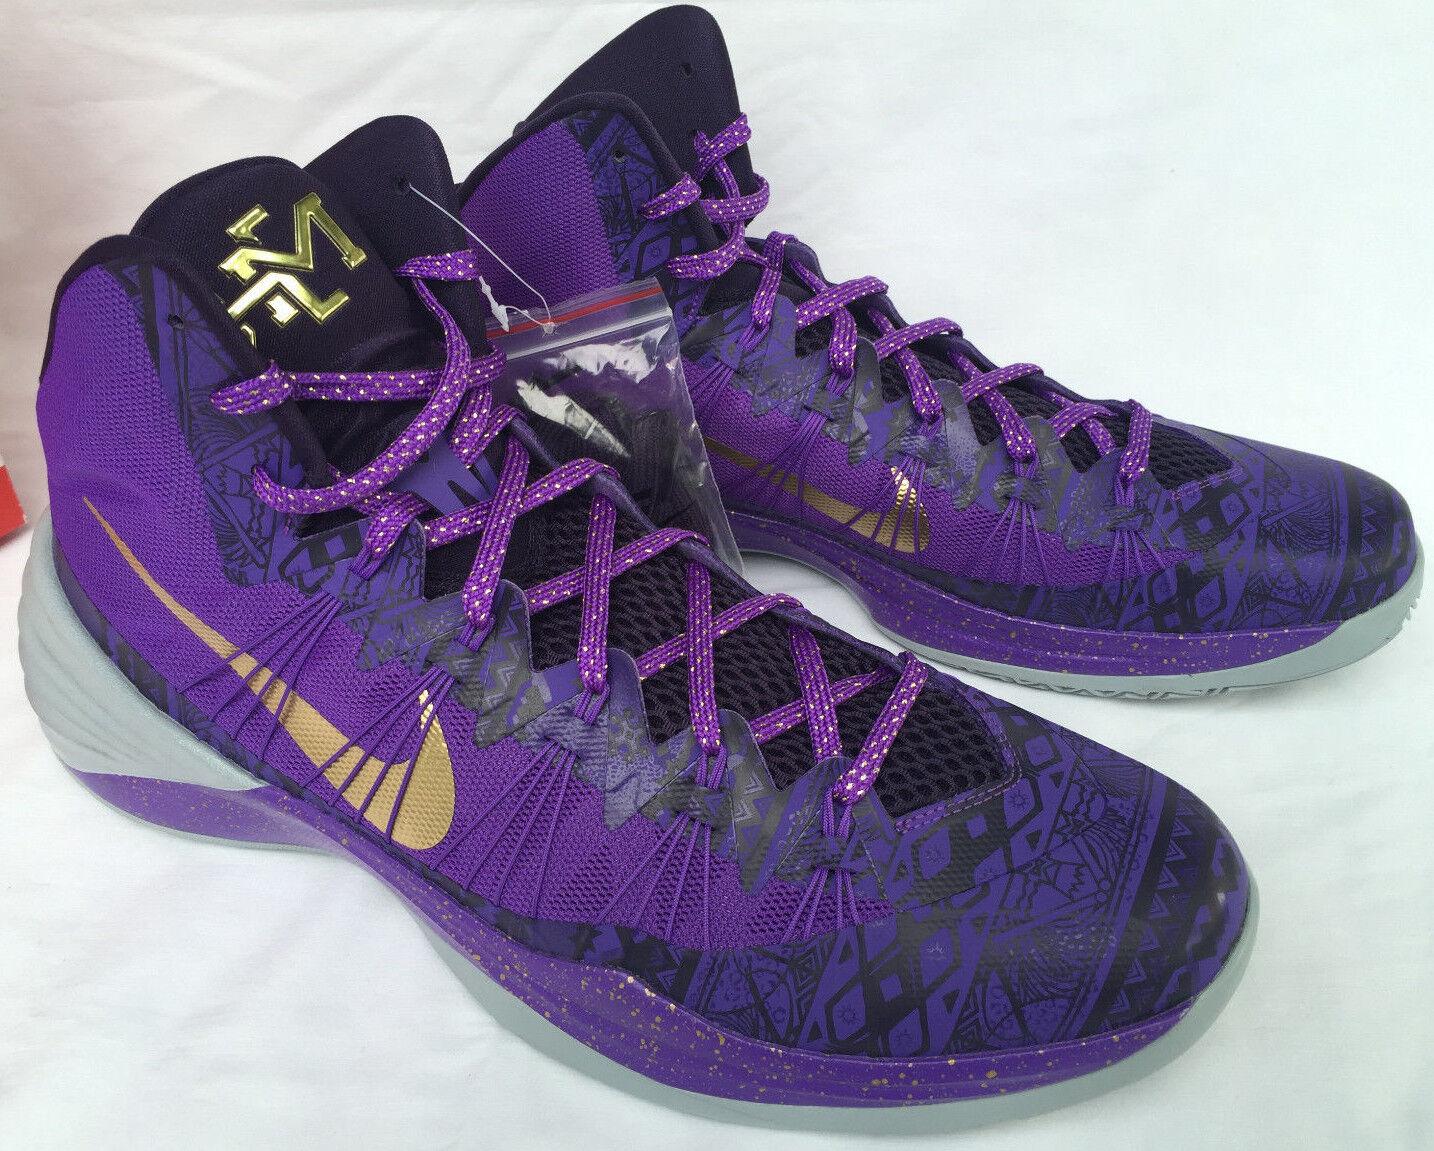 Nike Hyperdunk 2018 Promo 668771-575 Chaussures BHM Noir History Basketball Chaussures 668771-575  Hommes 16 3f1e86